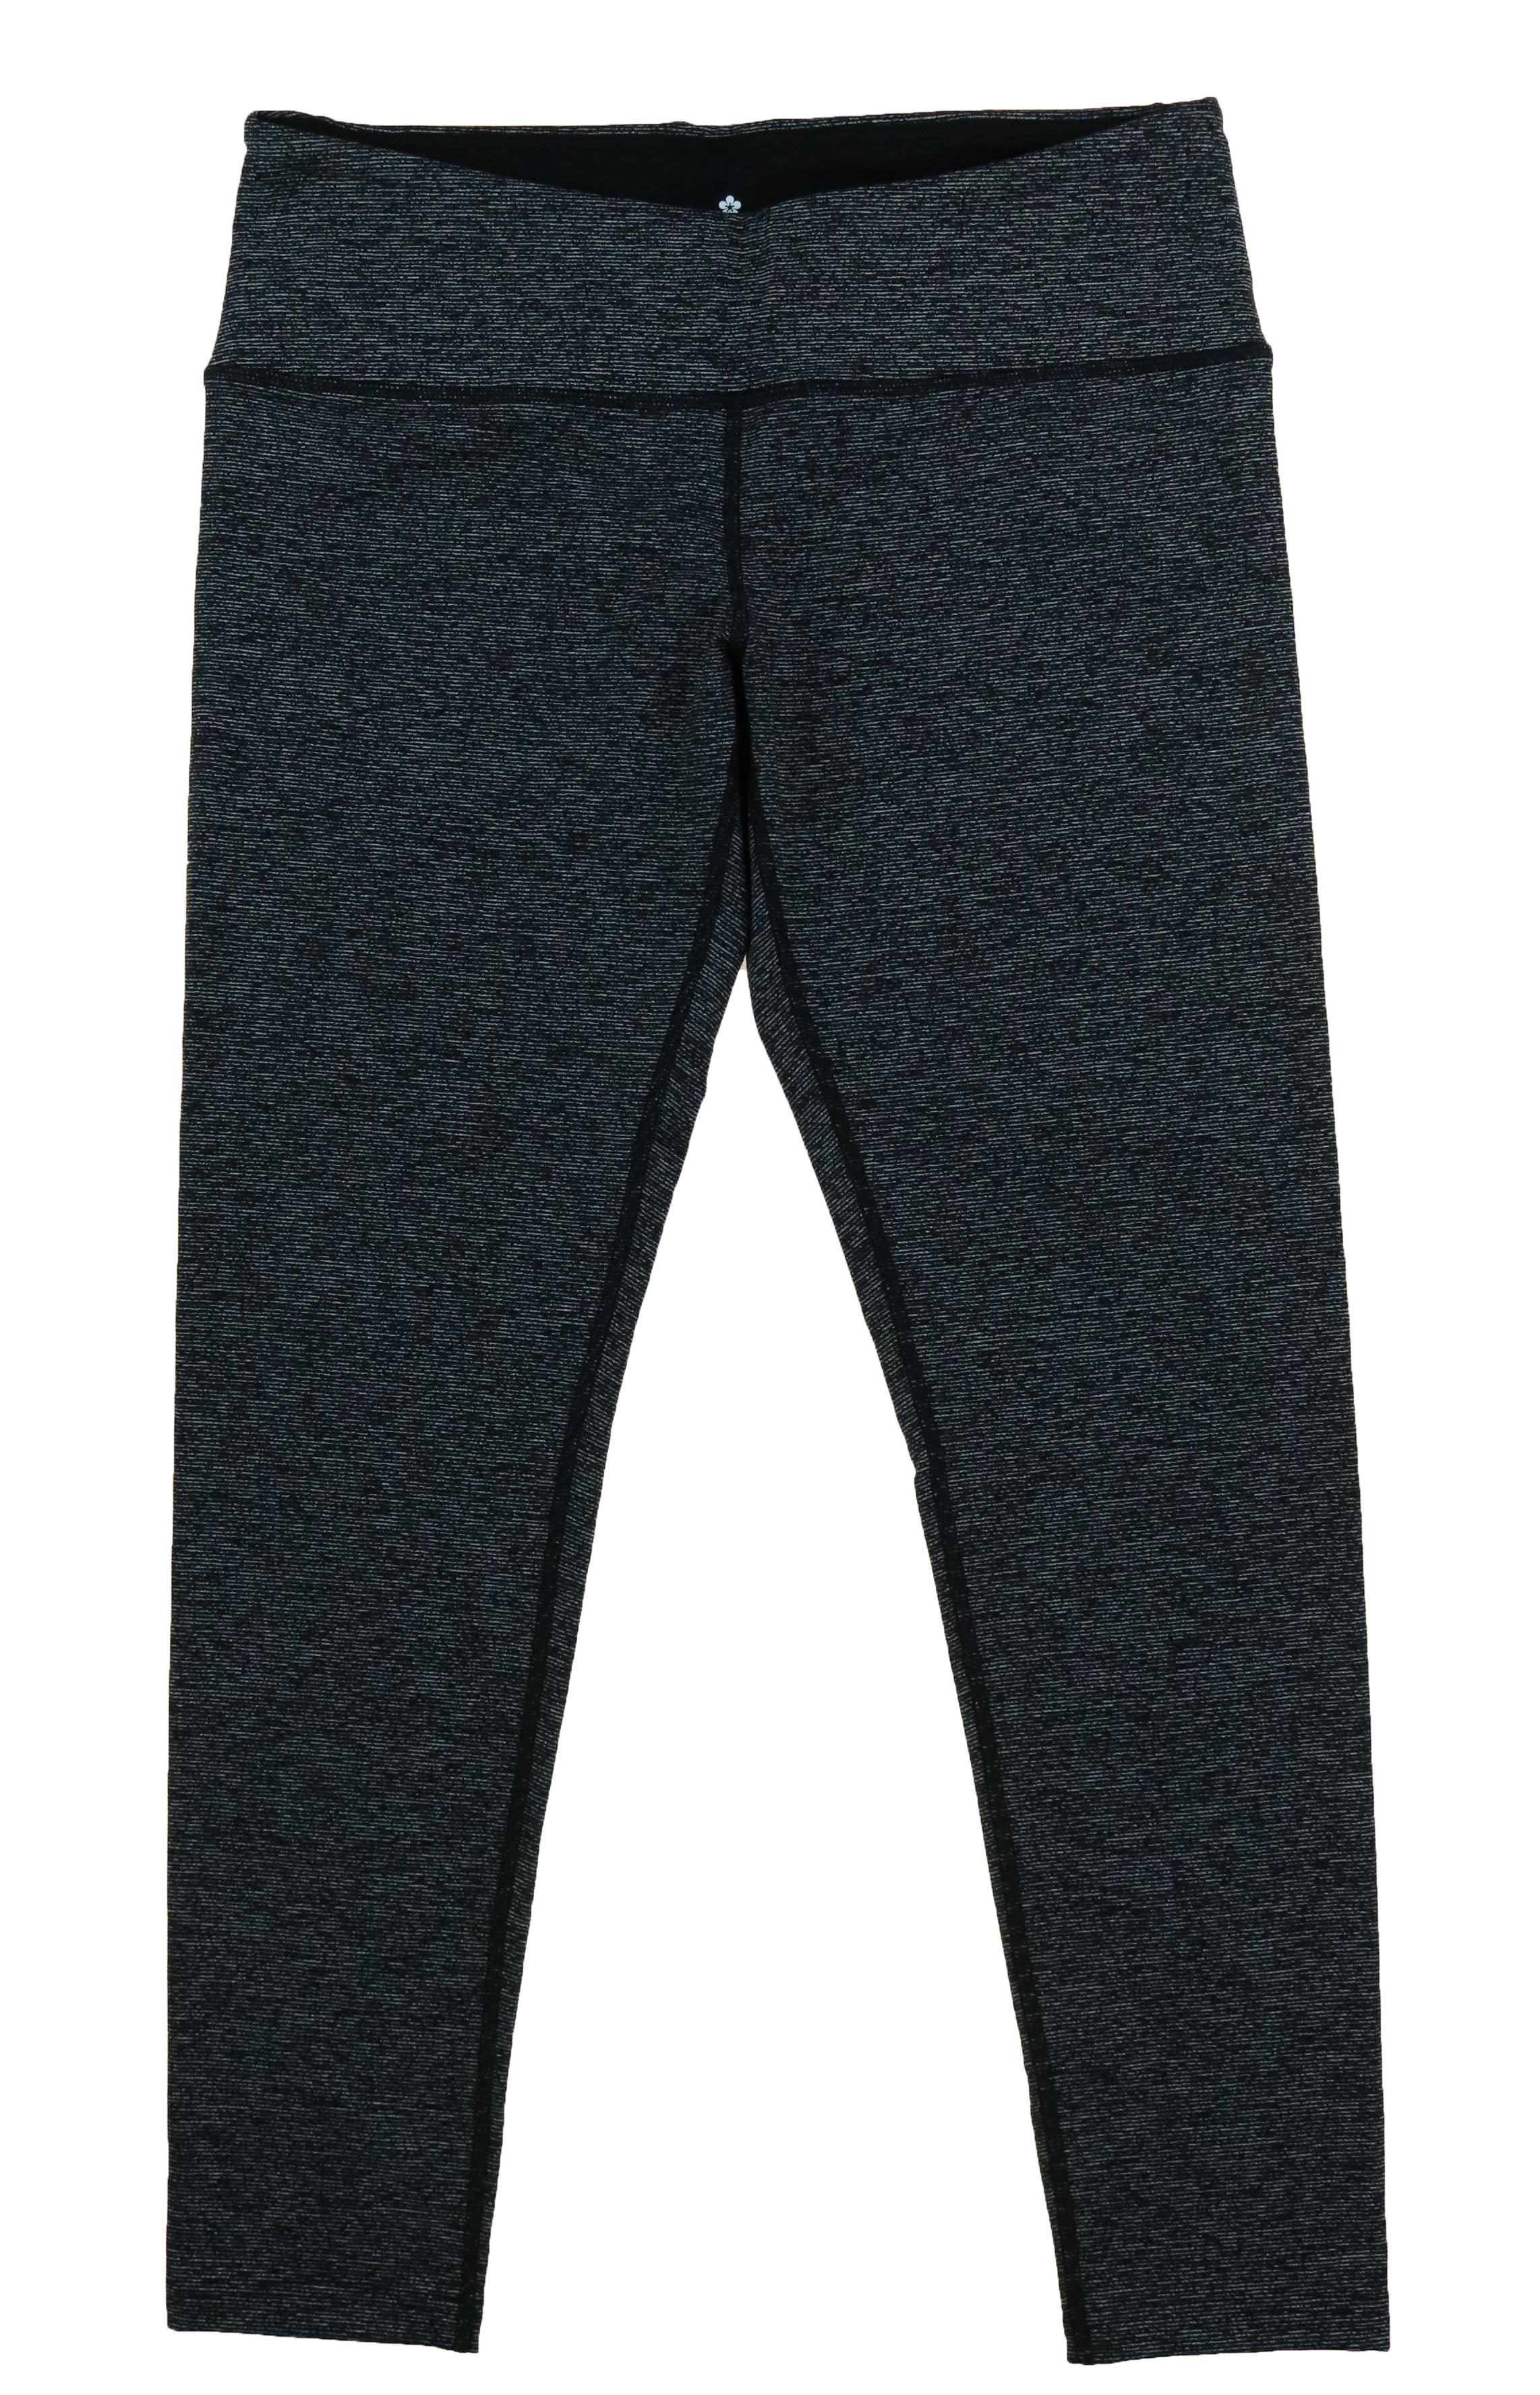 dff084f114bb5 Tuff Athletics - TUFF ATHLETICS Women's Yoga, Fitness Workout Legging Pants  (Black/White Noise, Large) - Walmart.com